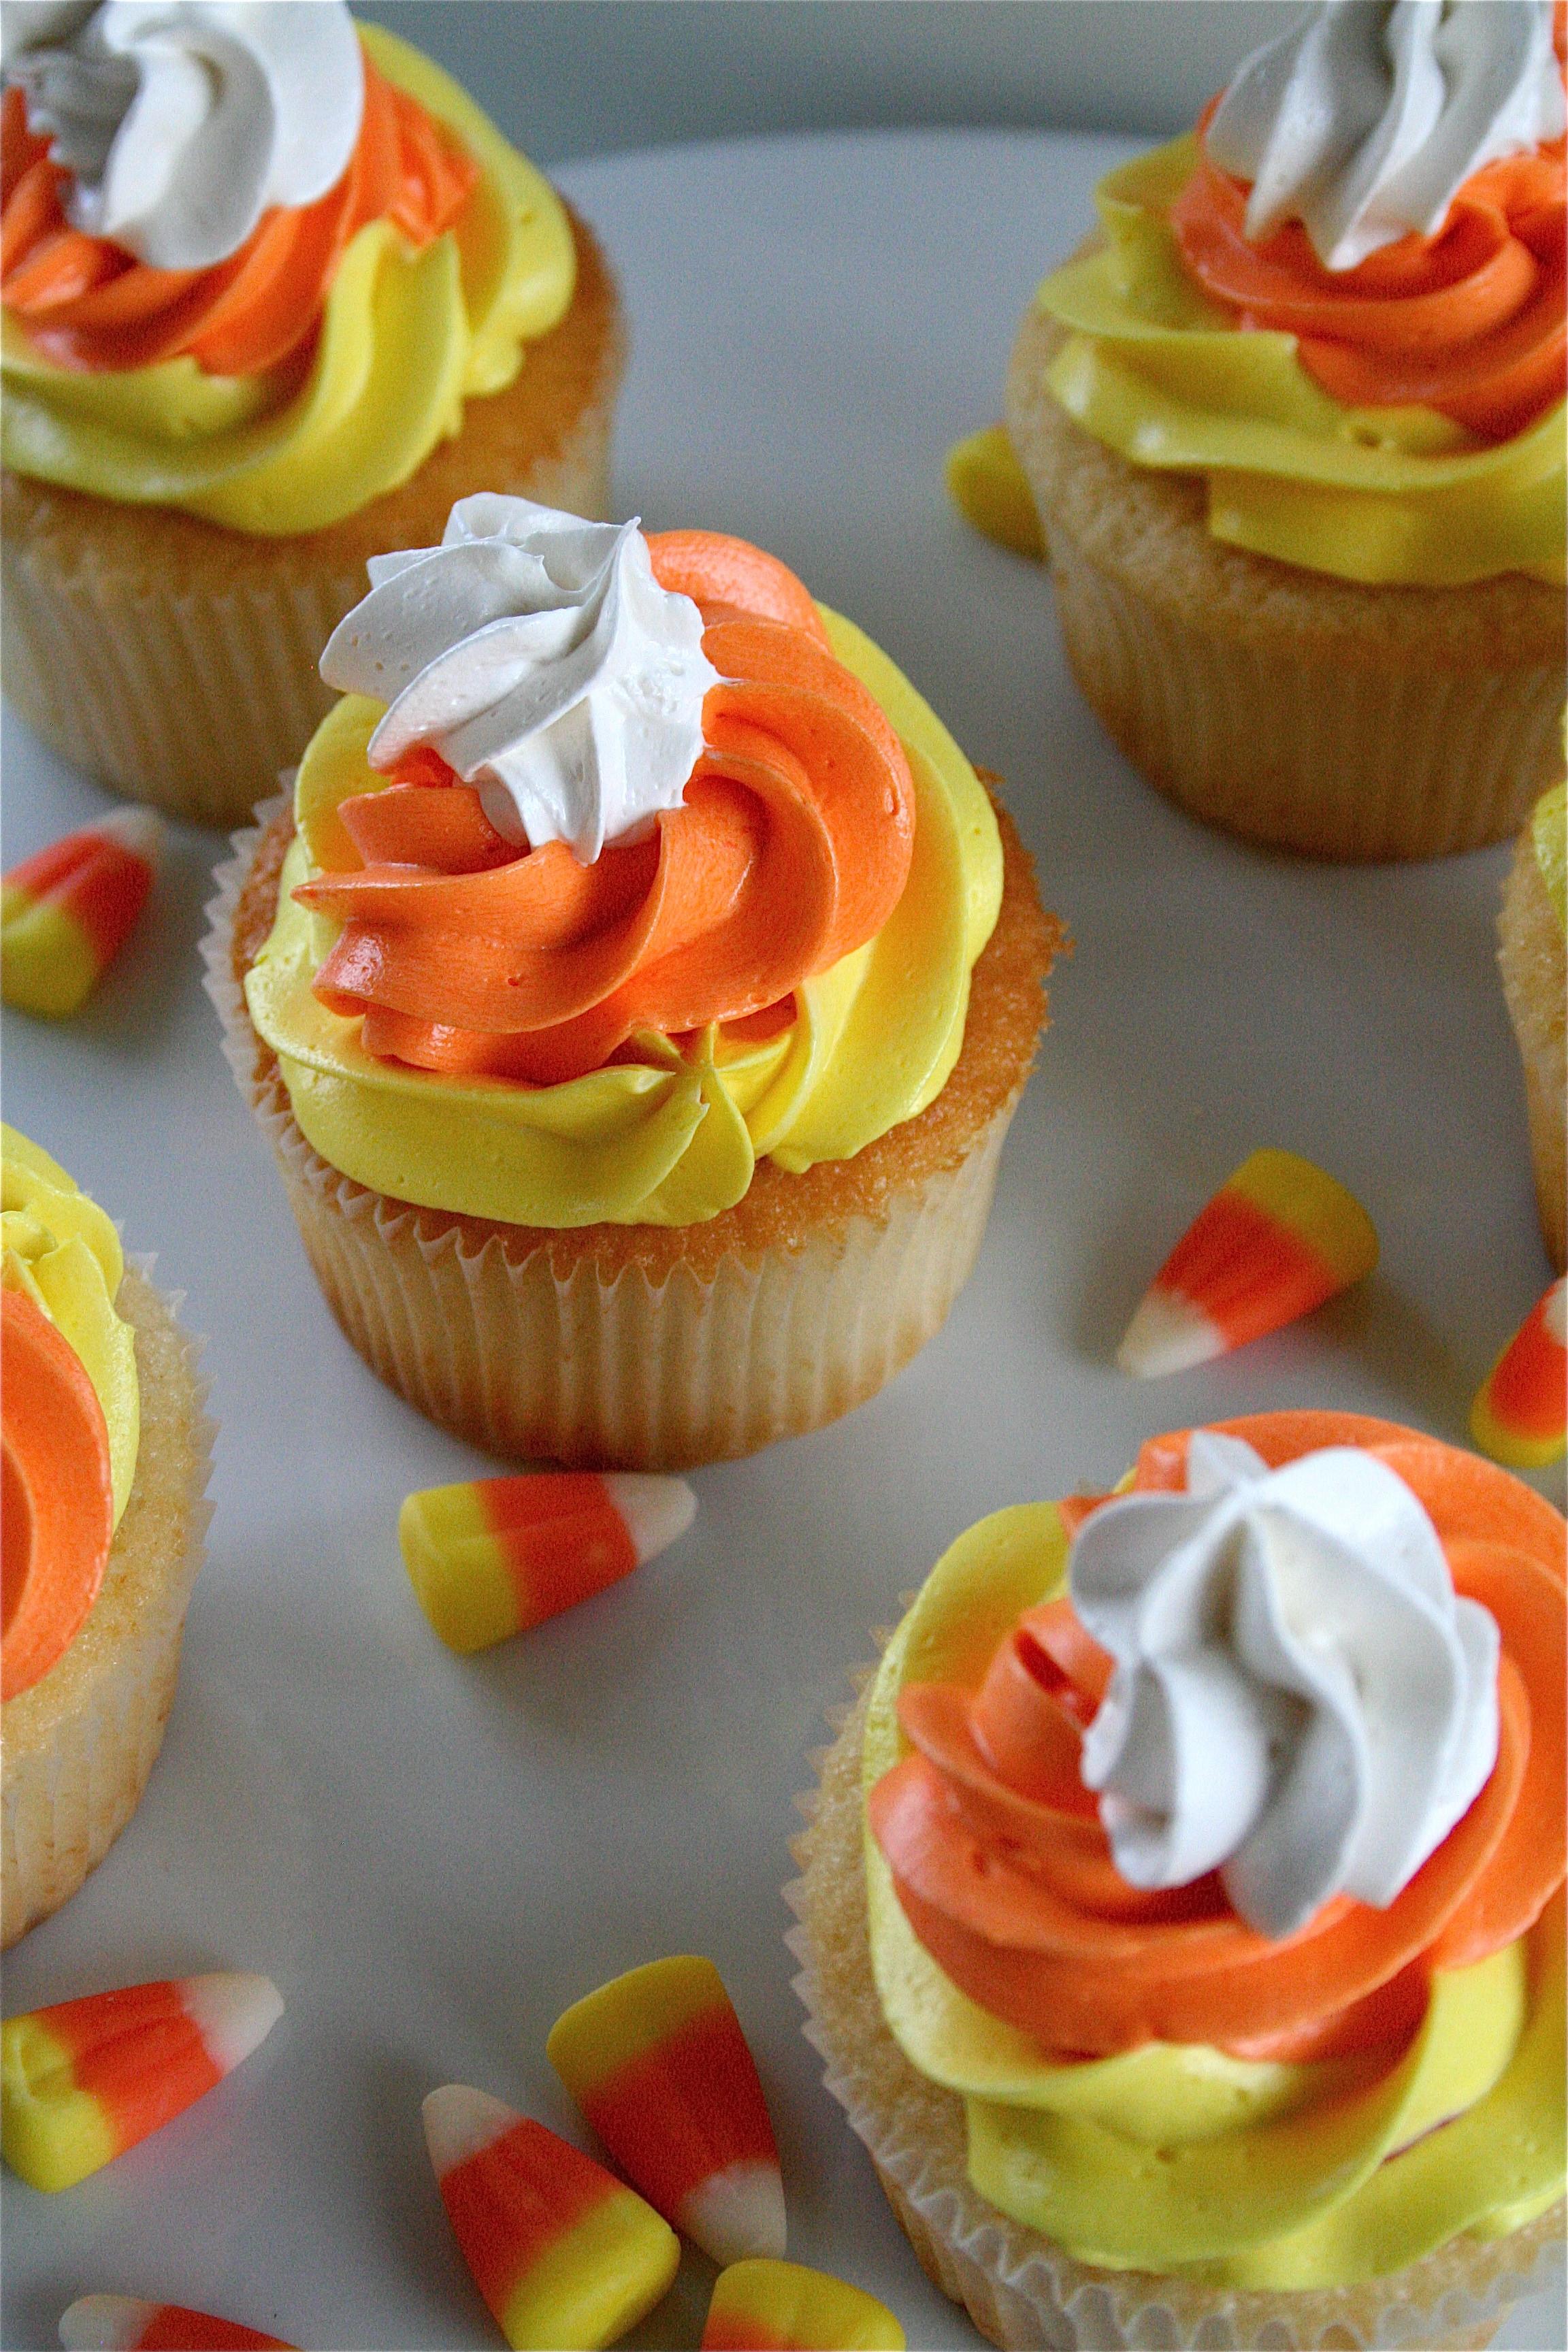 Simple Halloween Cupcakes  28 Cute Halloween Cupcakes Easy Recipes for Halloween